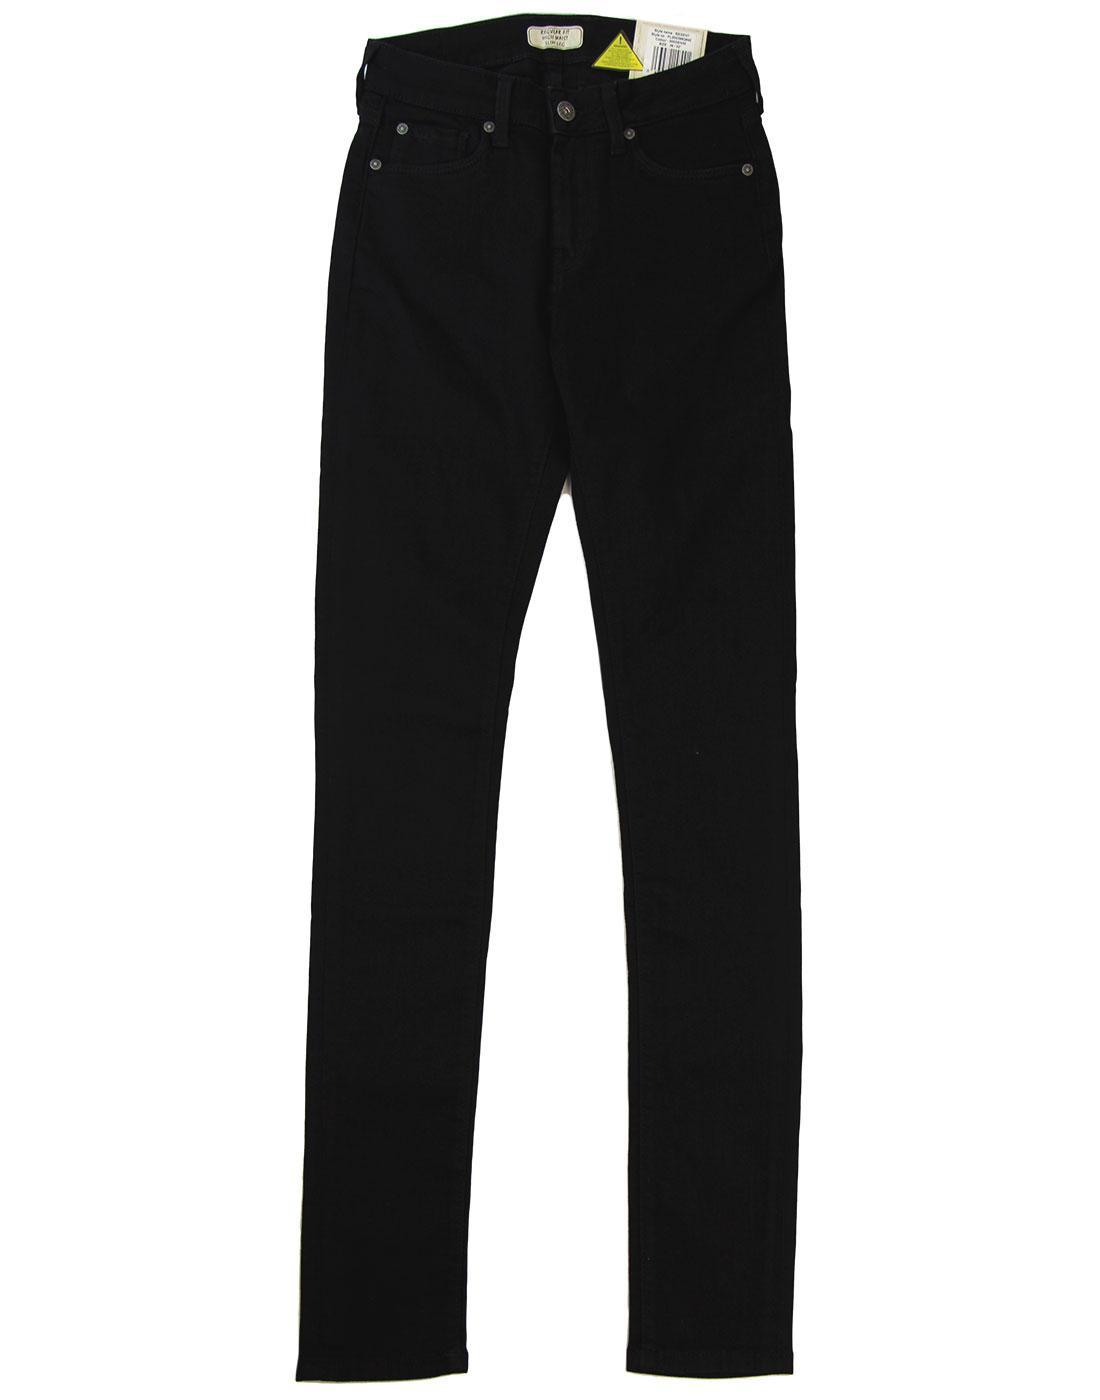 Regent PEPE JEANS Retro Skinny Denim Jeans Q94